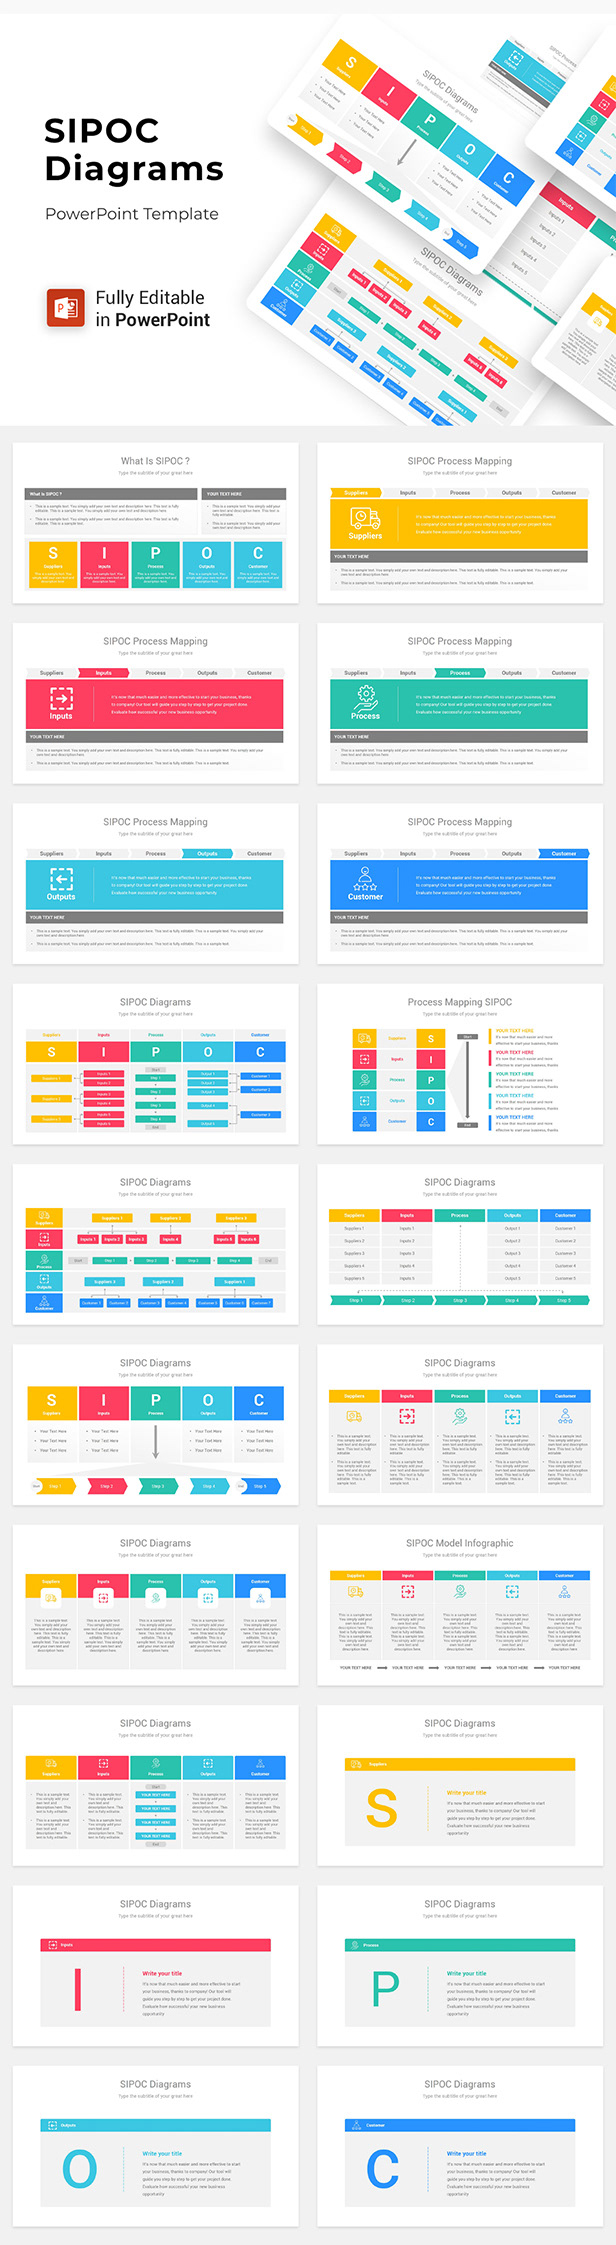 Slide Deck - Multipurpose PowerPoint Template - 5